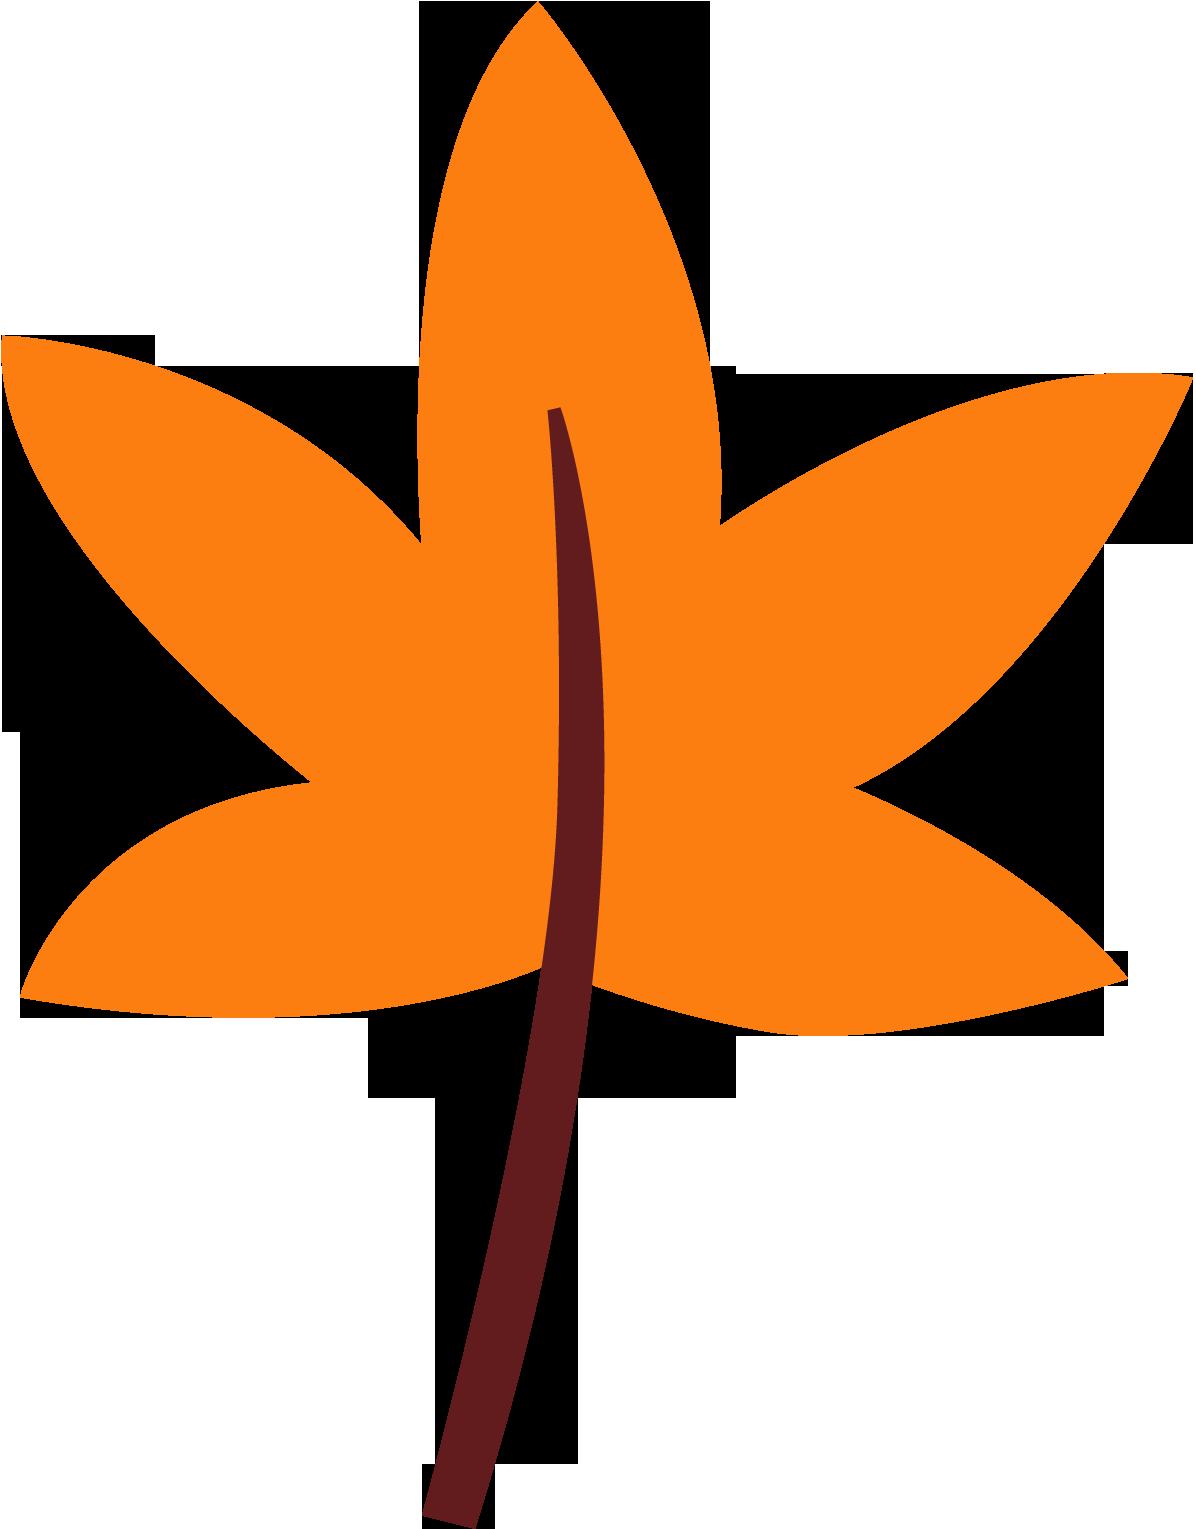 orange leaf clip art - photo #31